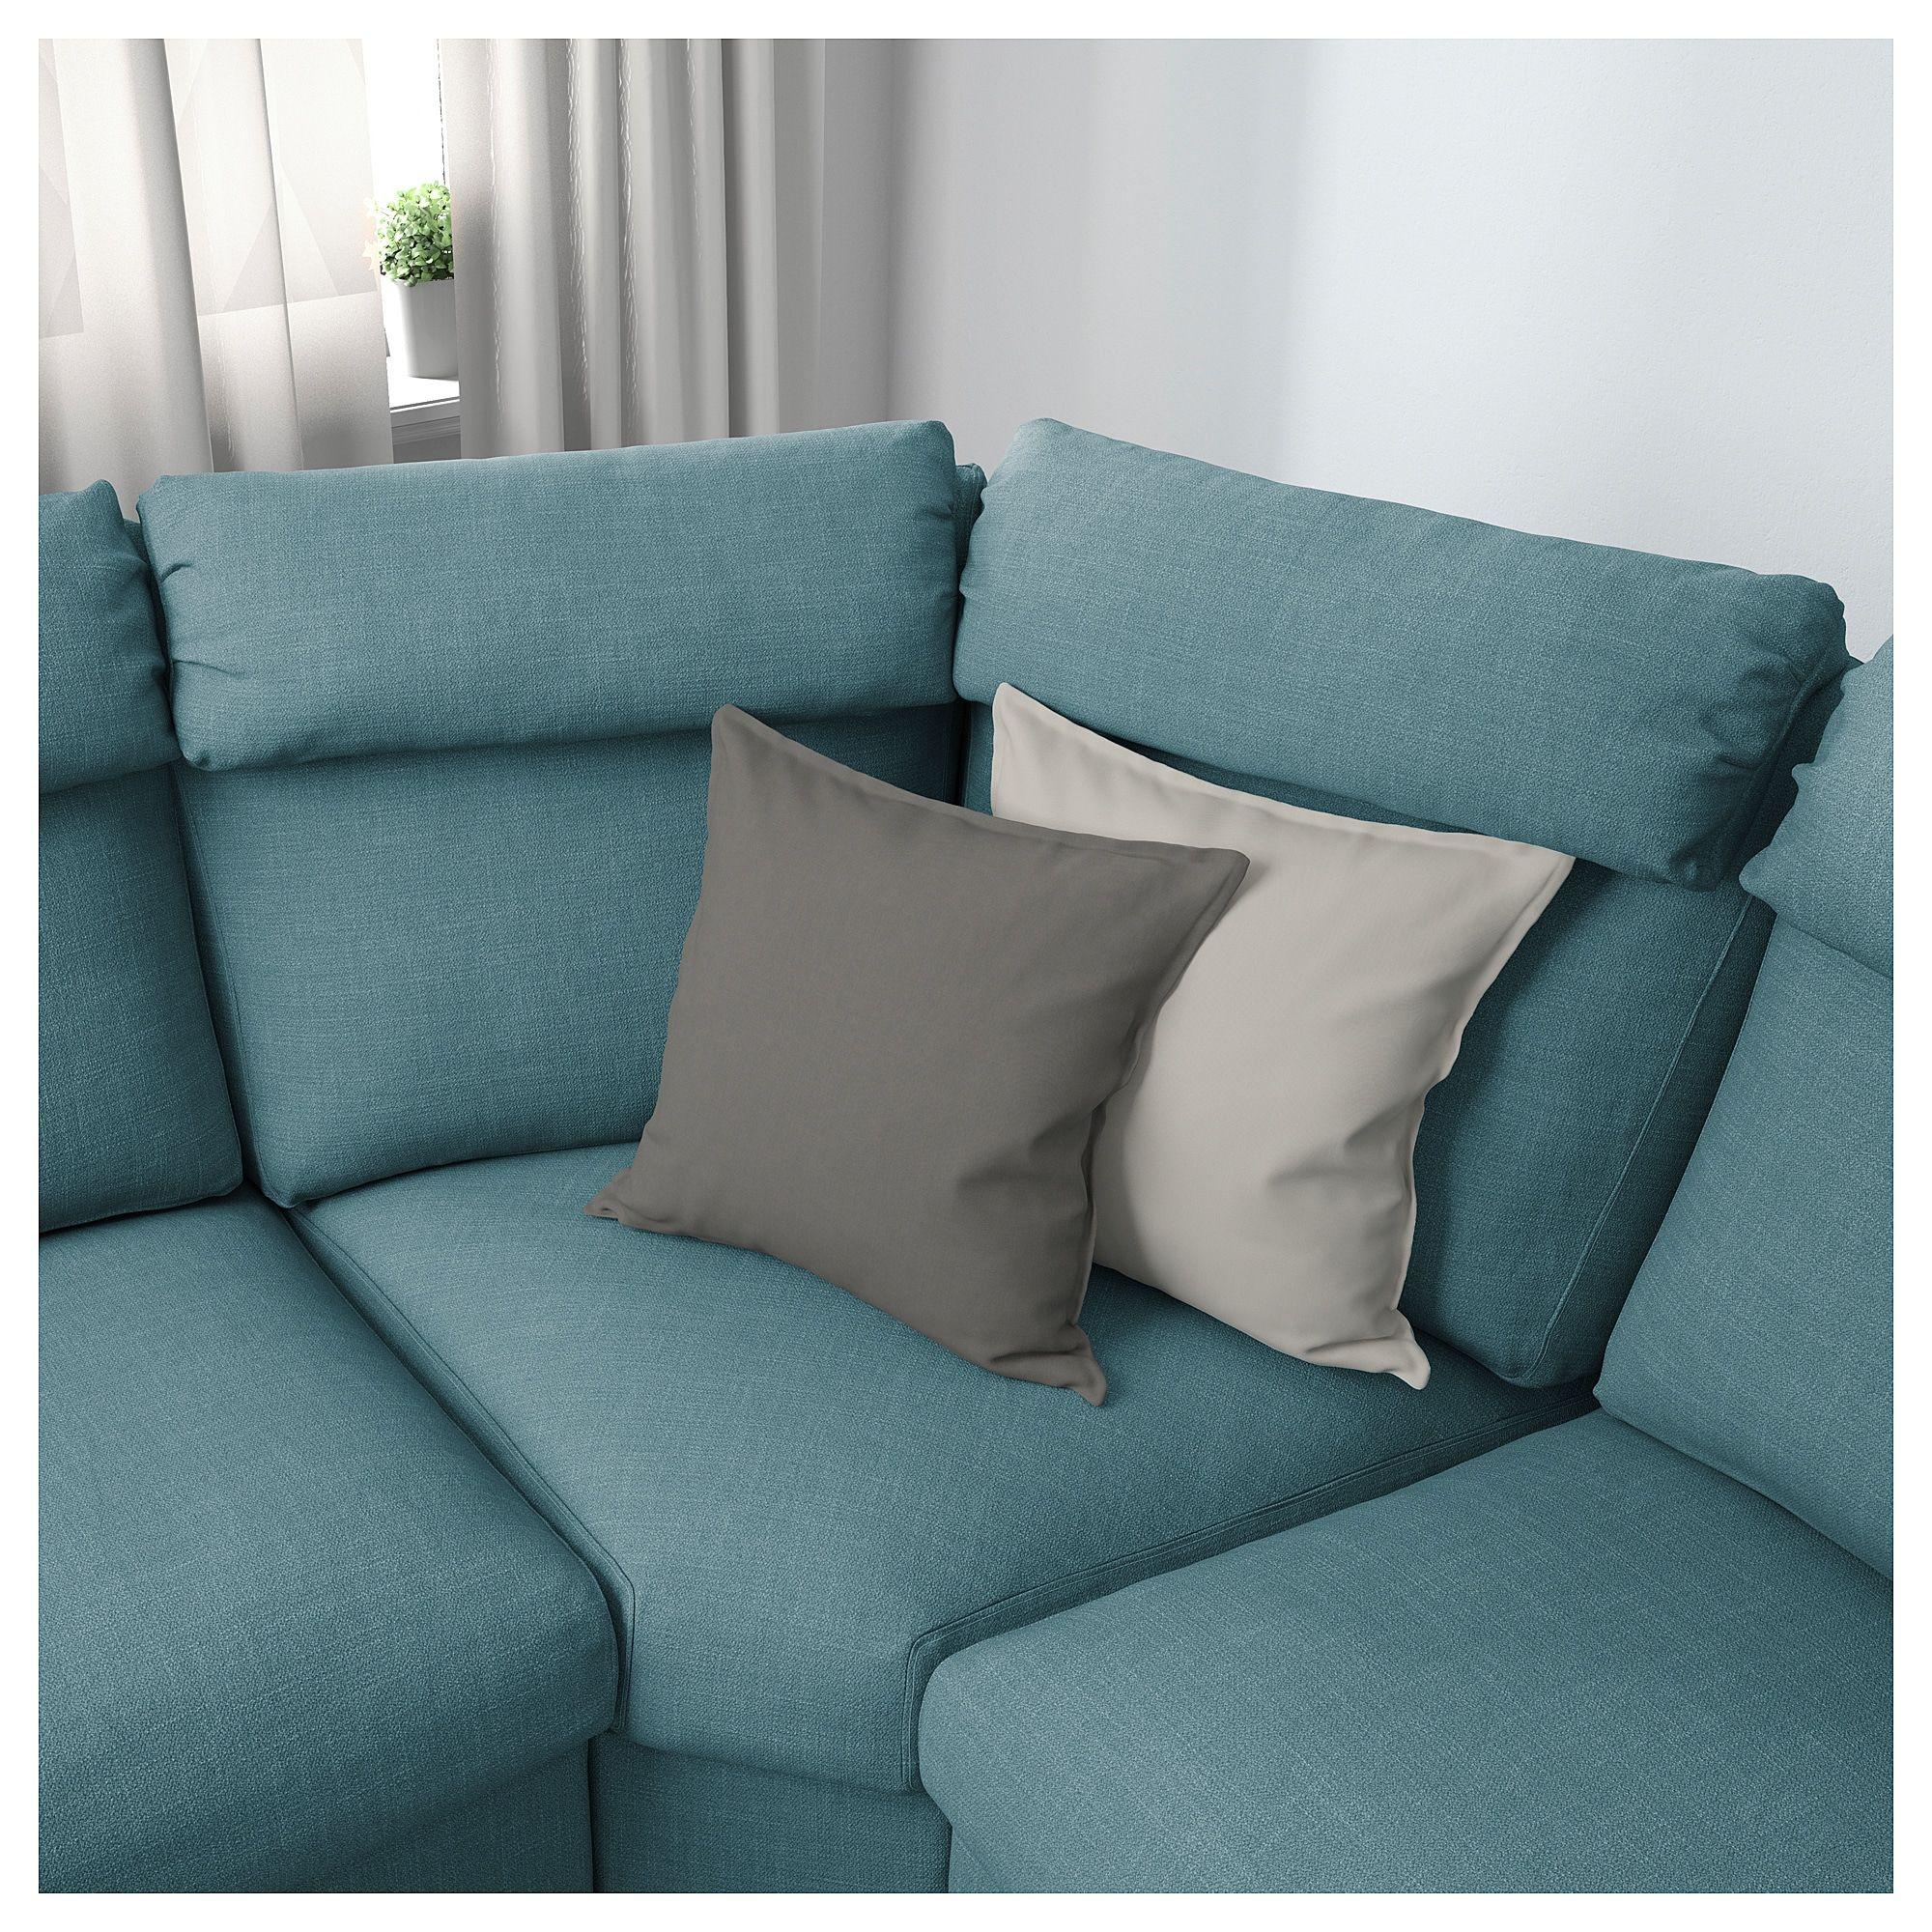 Brilliant Lidhult Sectional 5 Seat Corner Gassebol Blue Gray In Machost Co Dining Chair Design Ideas Machostcouk